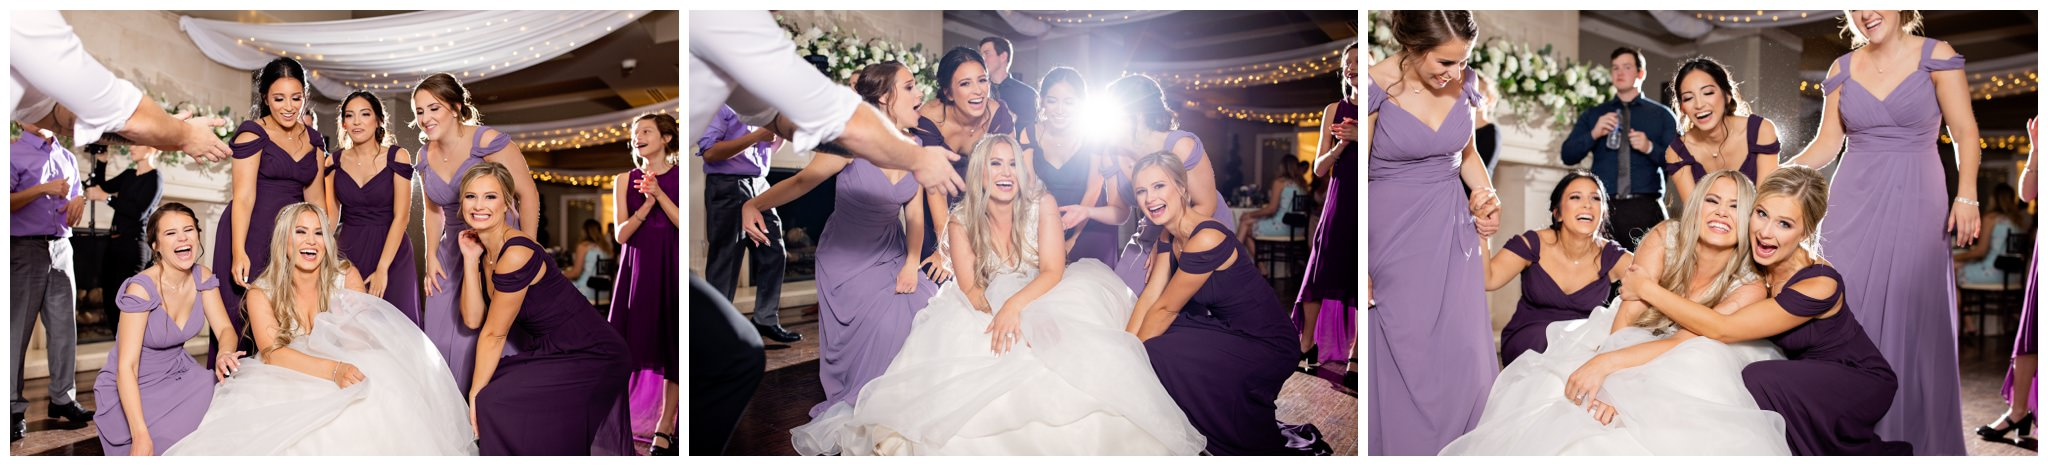 Bridesmaids dancing at Sleepy Ridge weddings